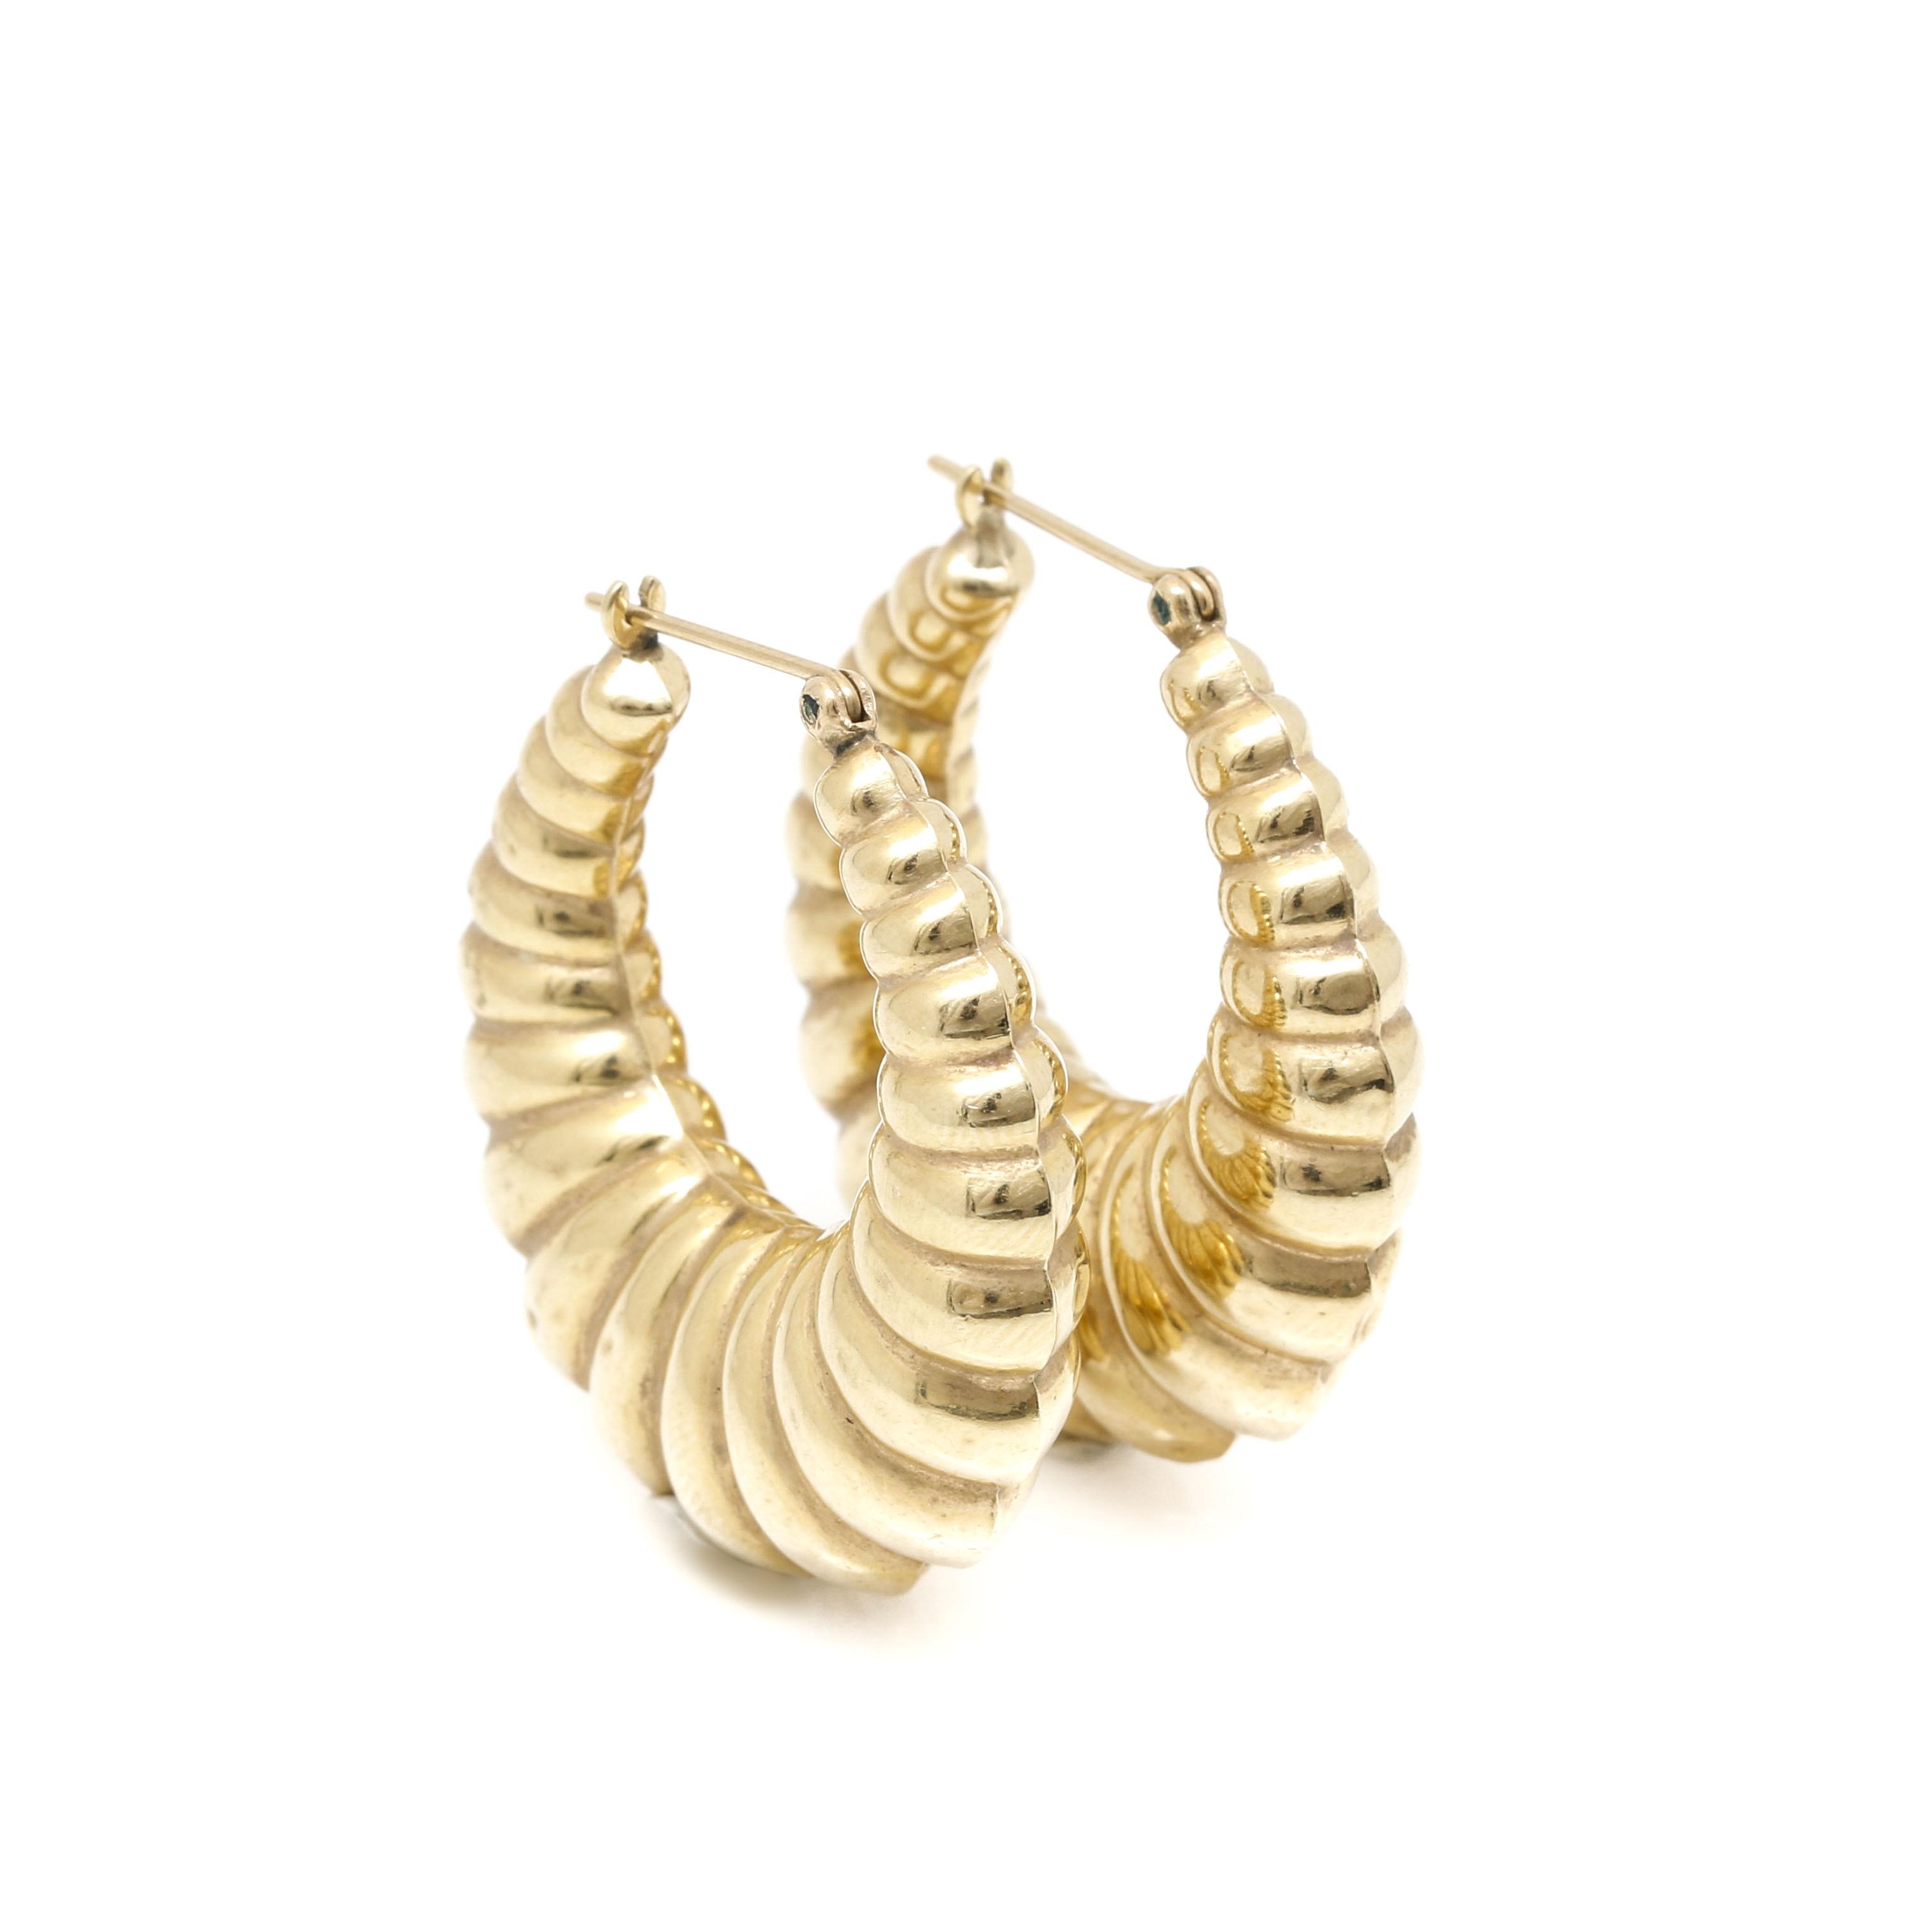 14K Yellow Gold Scalloped Hoop Style Earrings